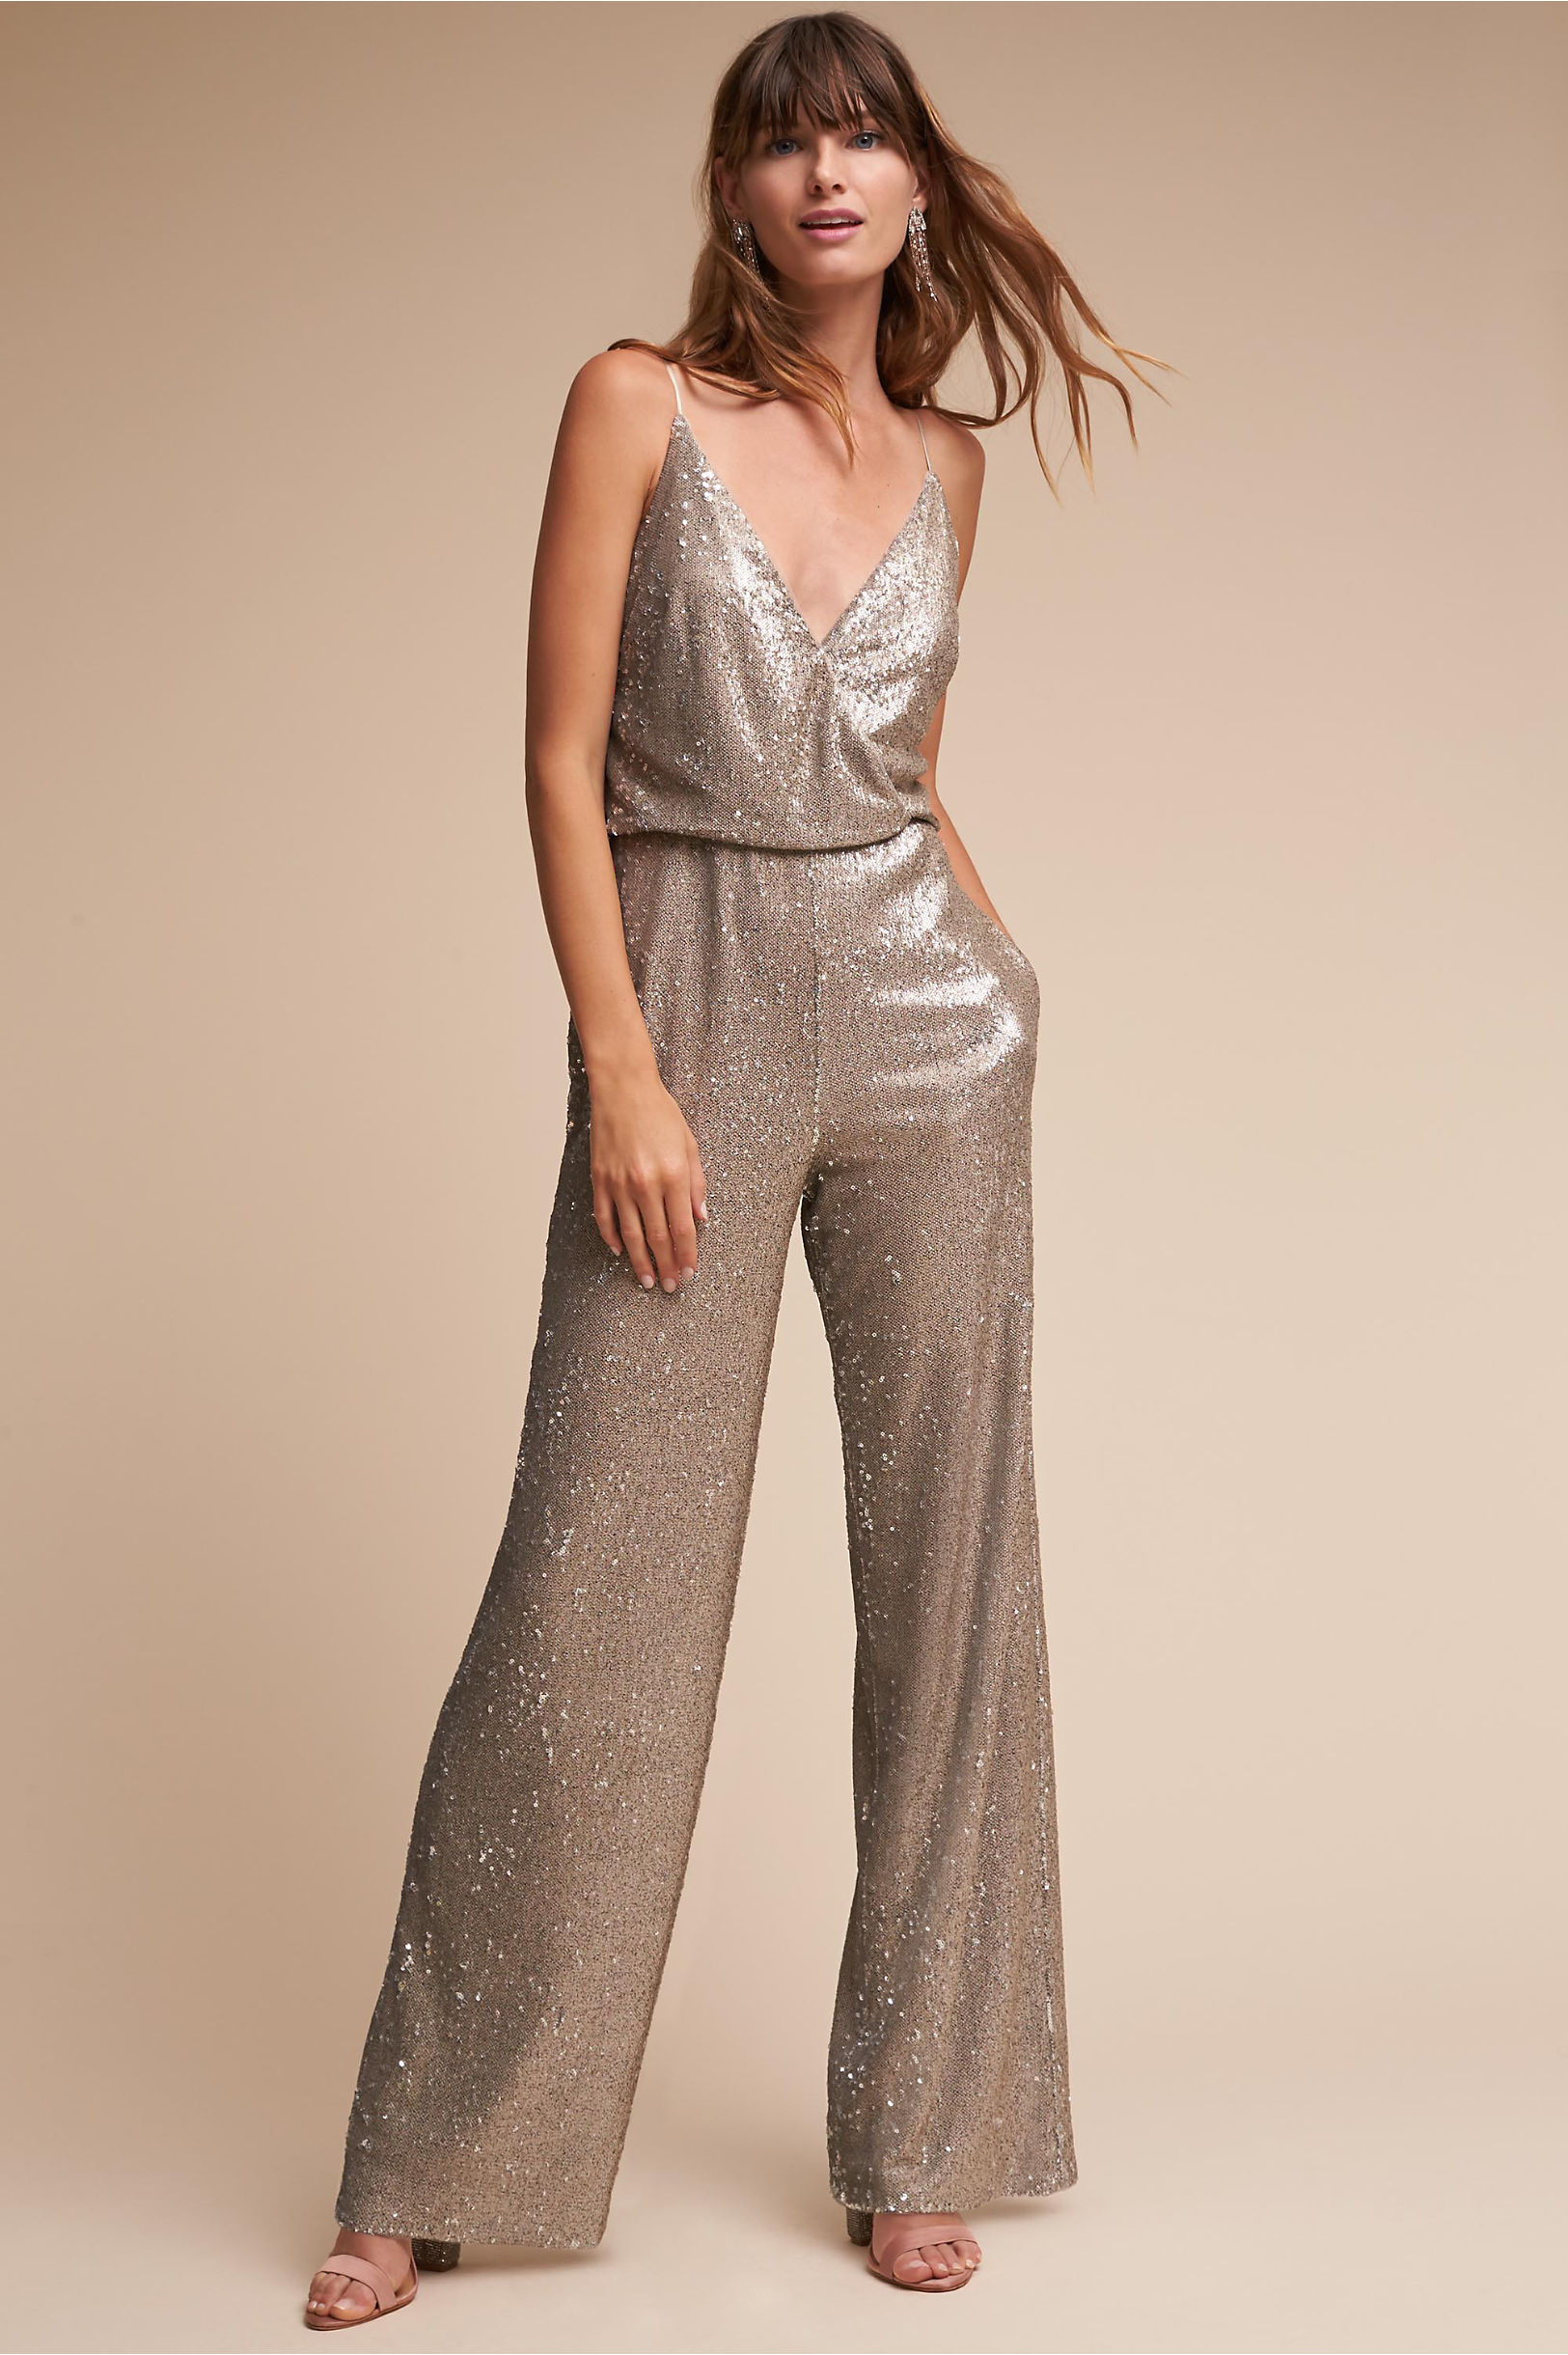 La Lune Sequin Jumpsuit Silver in Sale | BHLDN